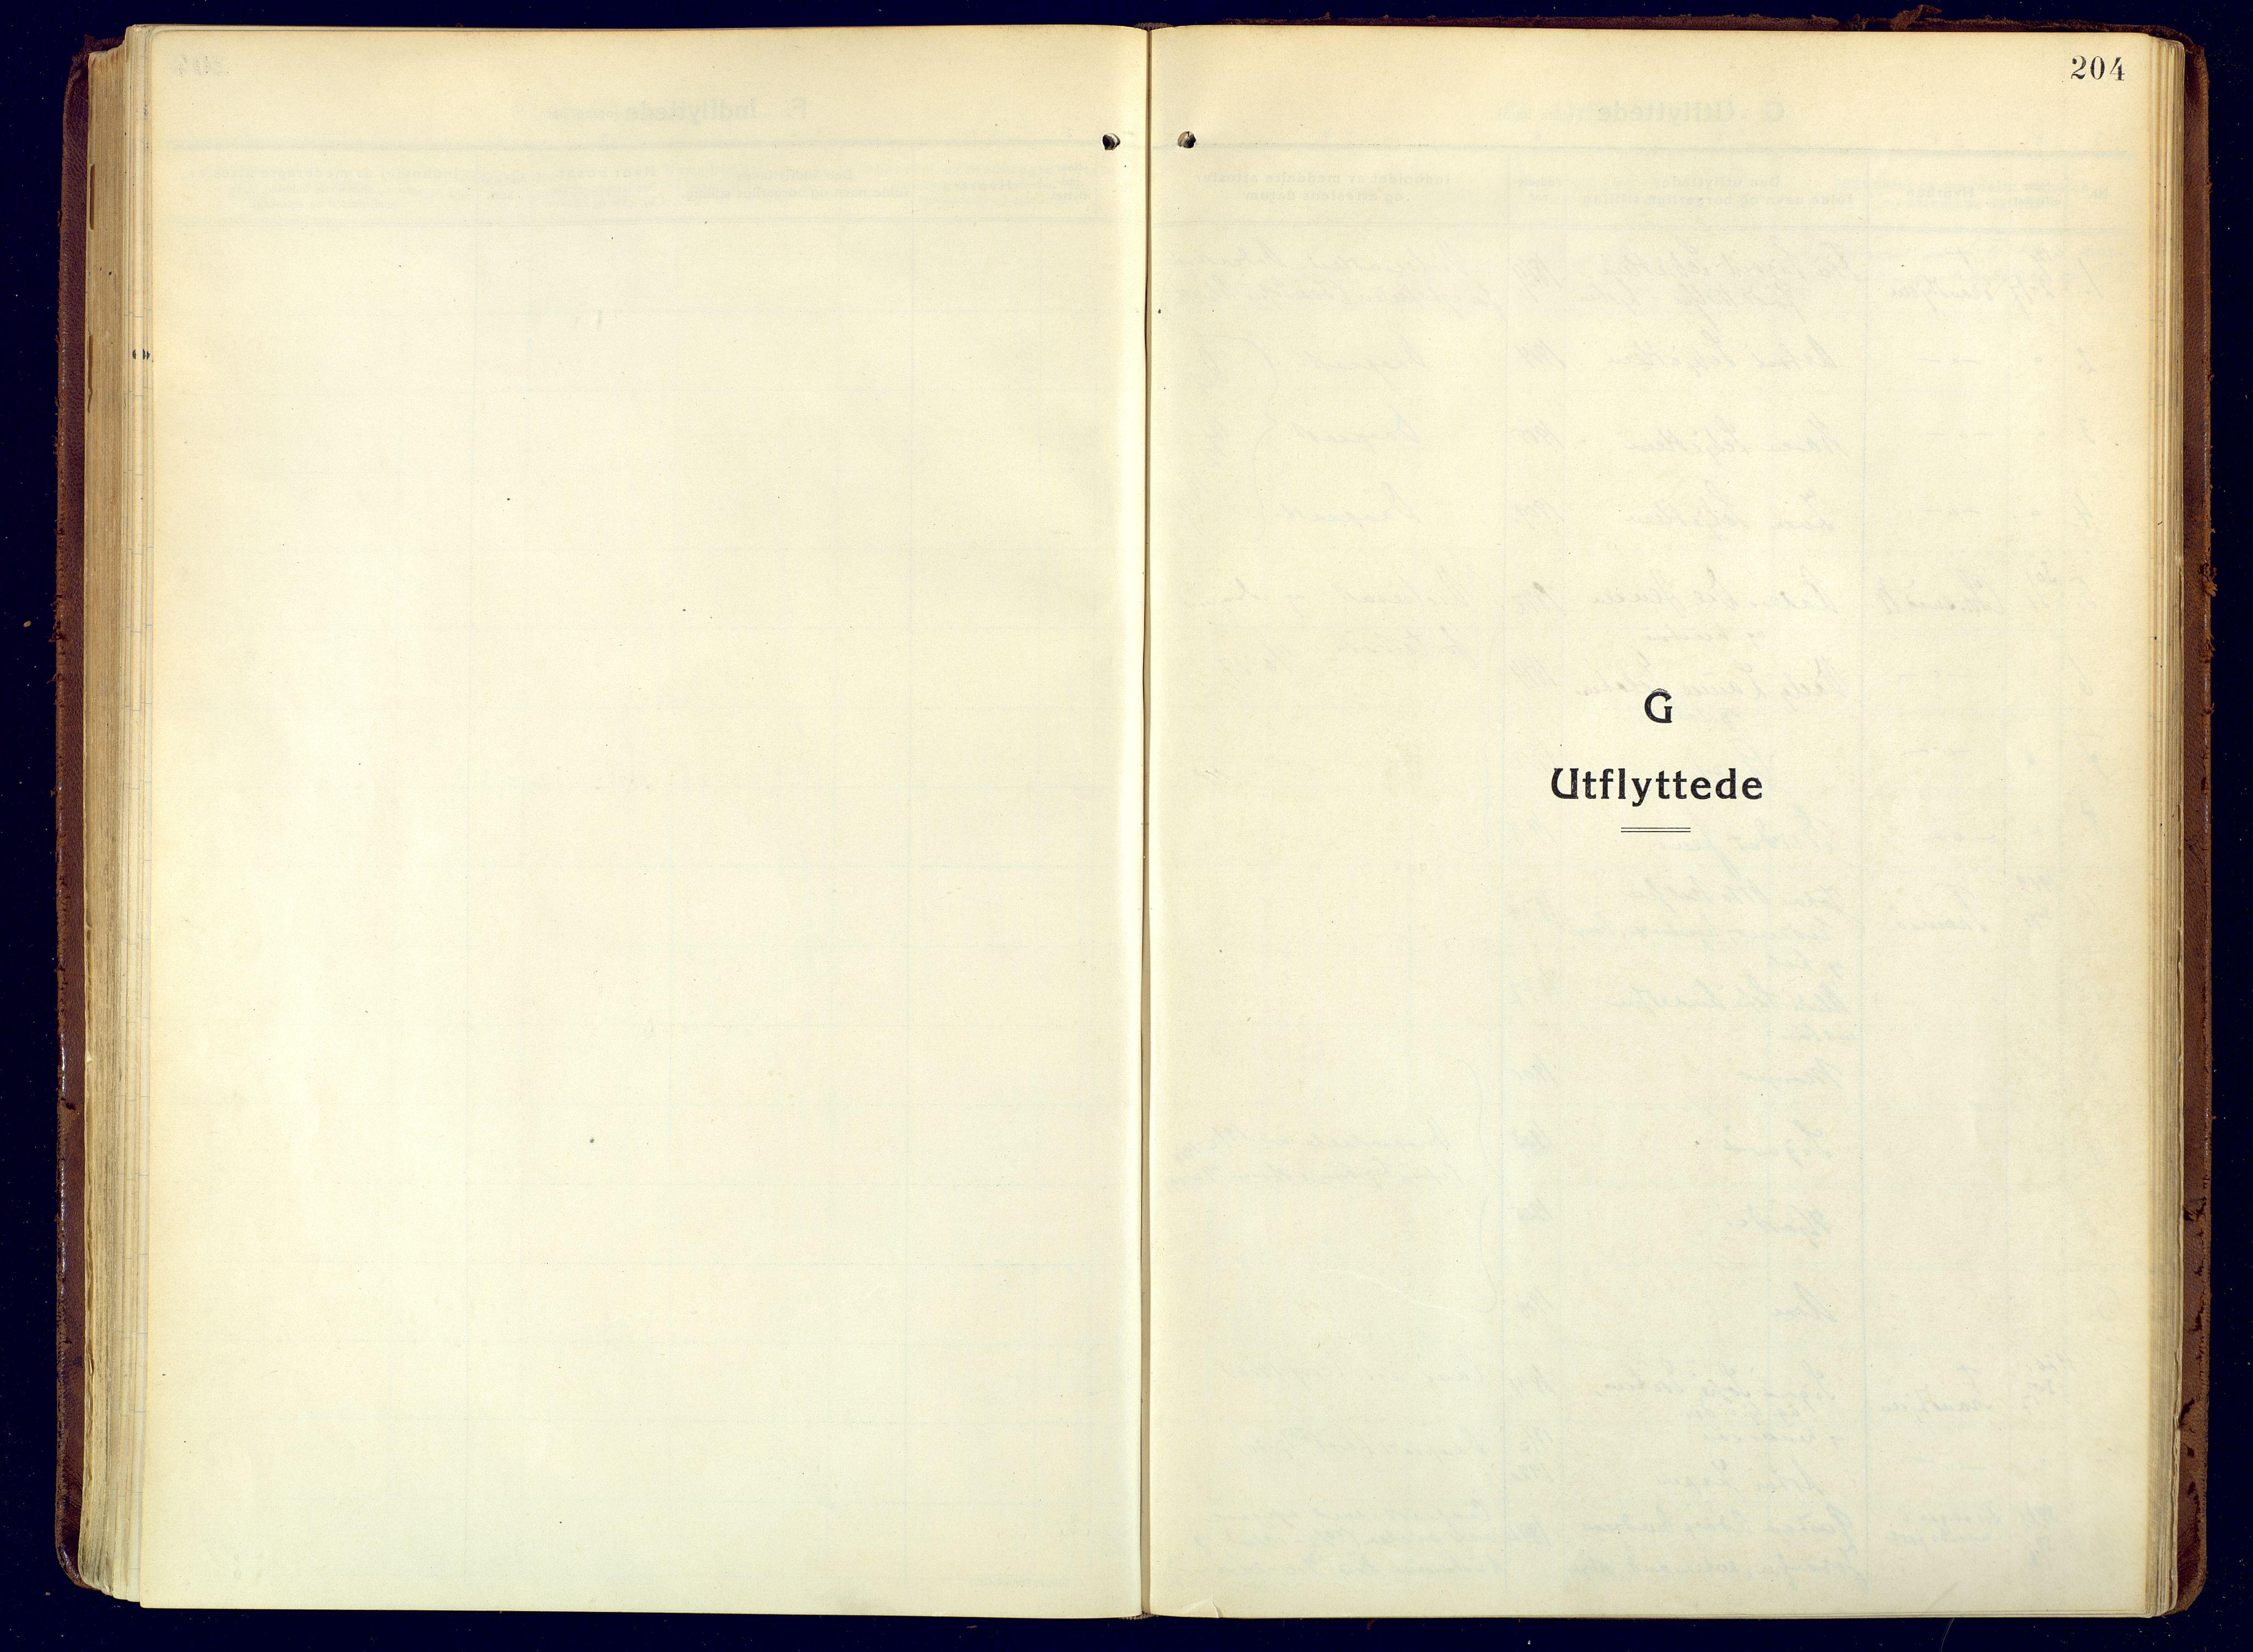 SATØ, Hammerfest sokneprestembete, Ministerialbok nr. 15, 1916-1923, s. 204